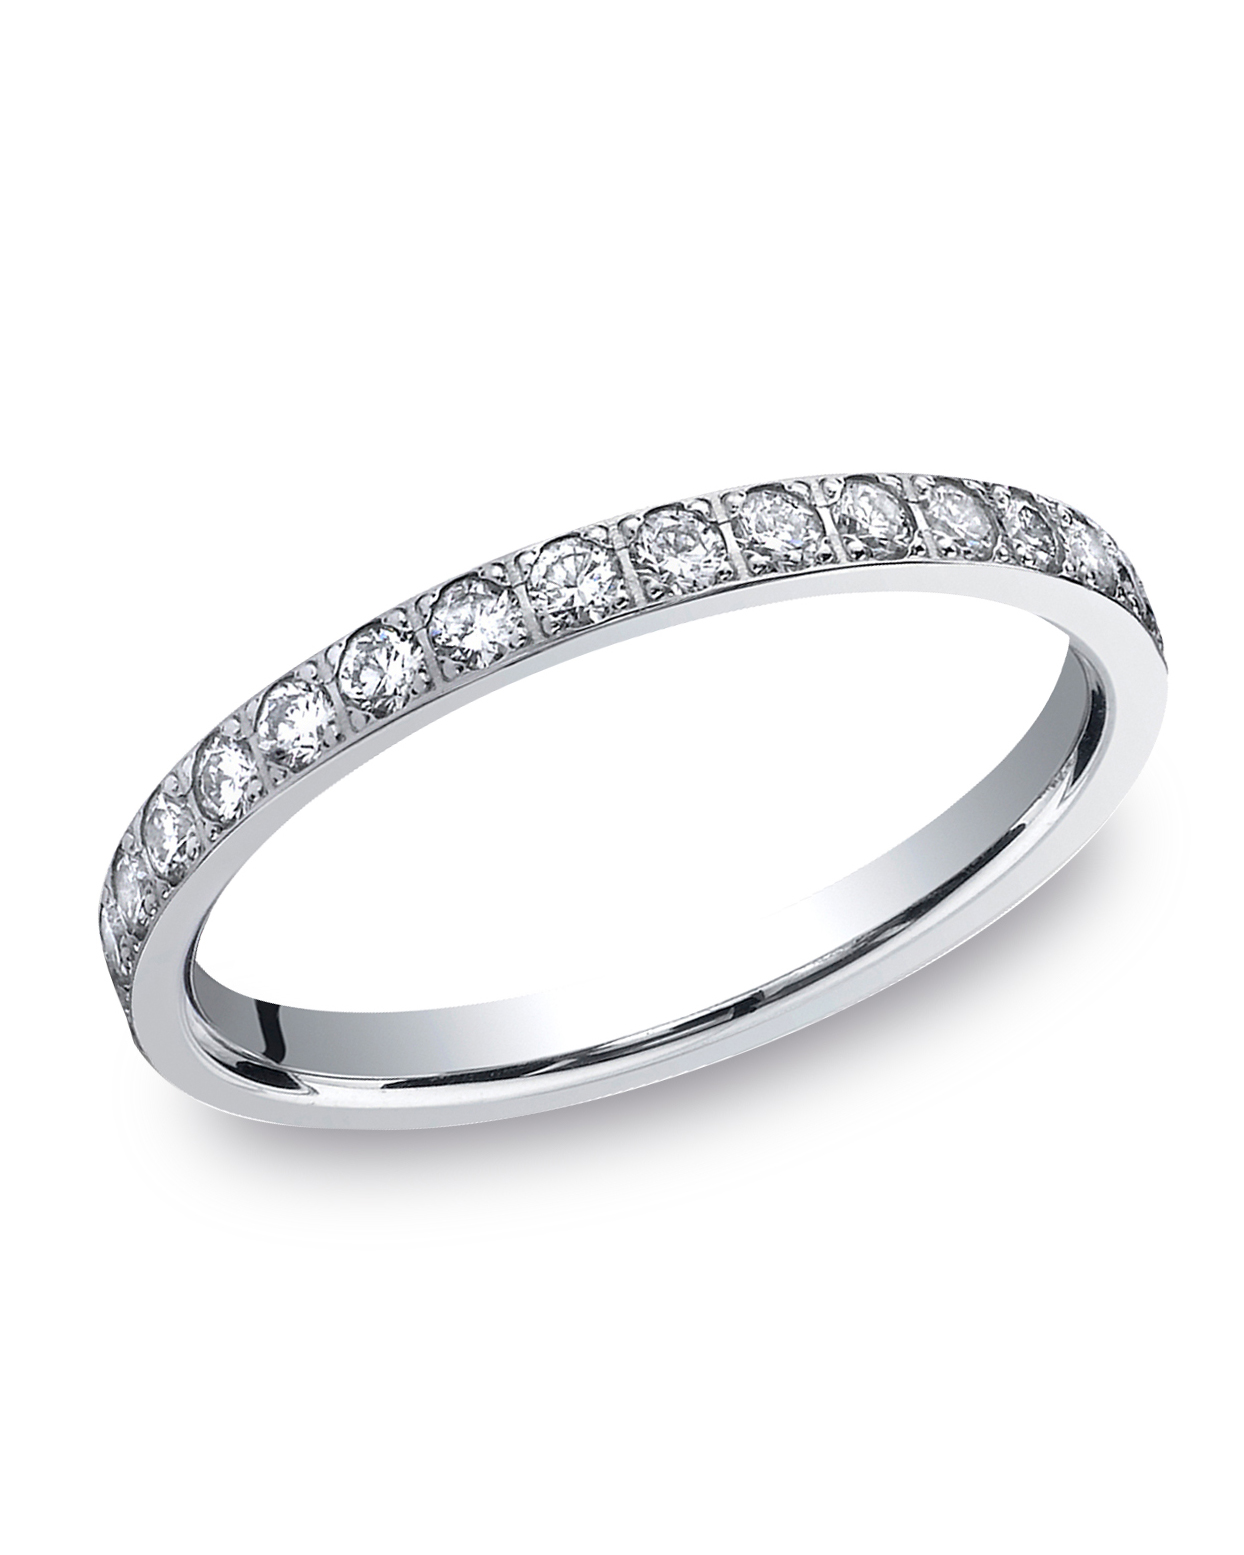 womens-wedding-bands-benchmark-0415.jpg